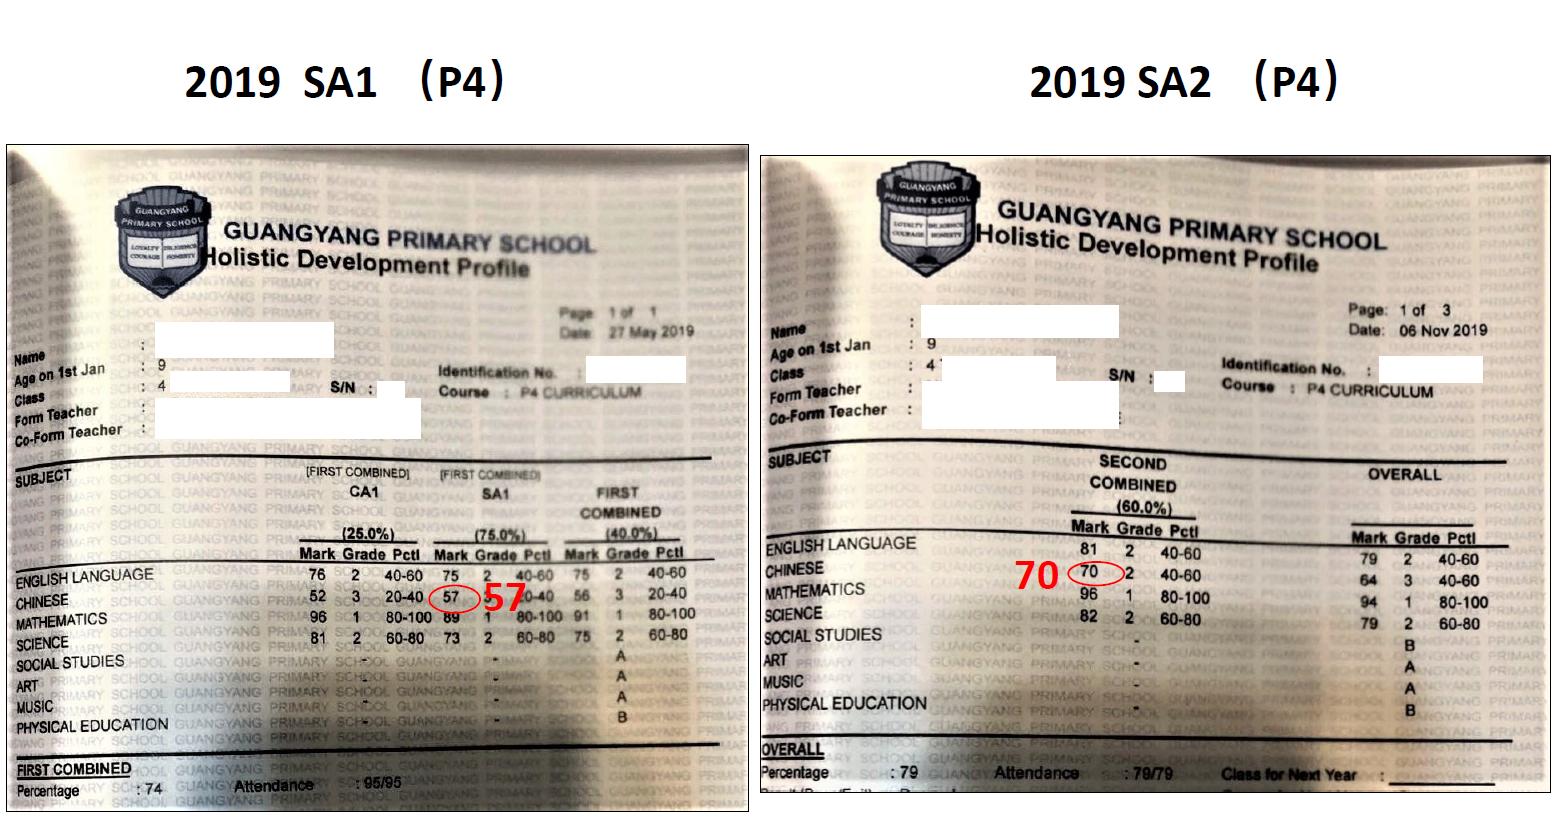 SA1 and SA2 scores comparison of P4